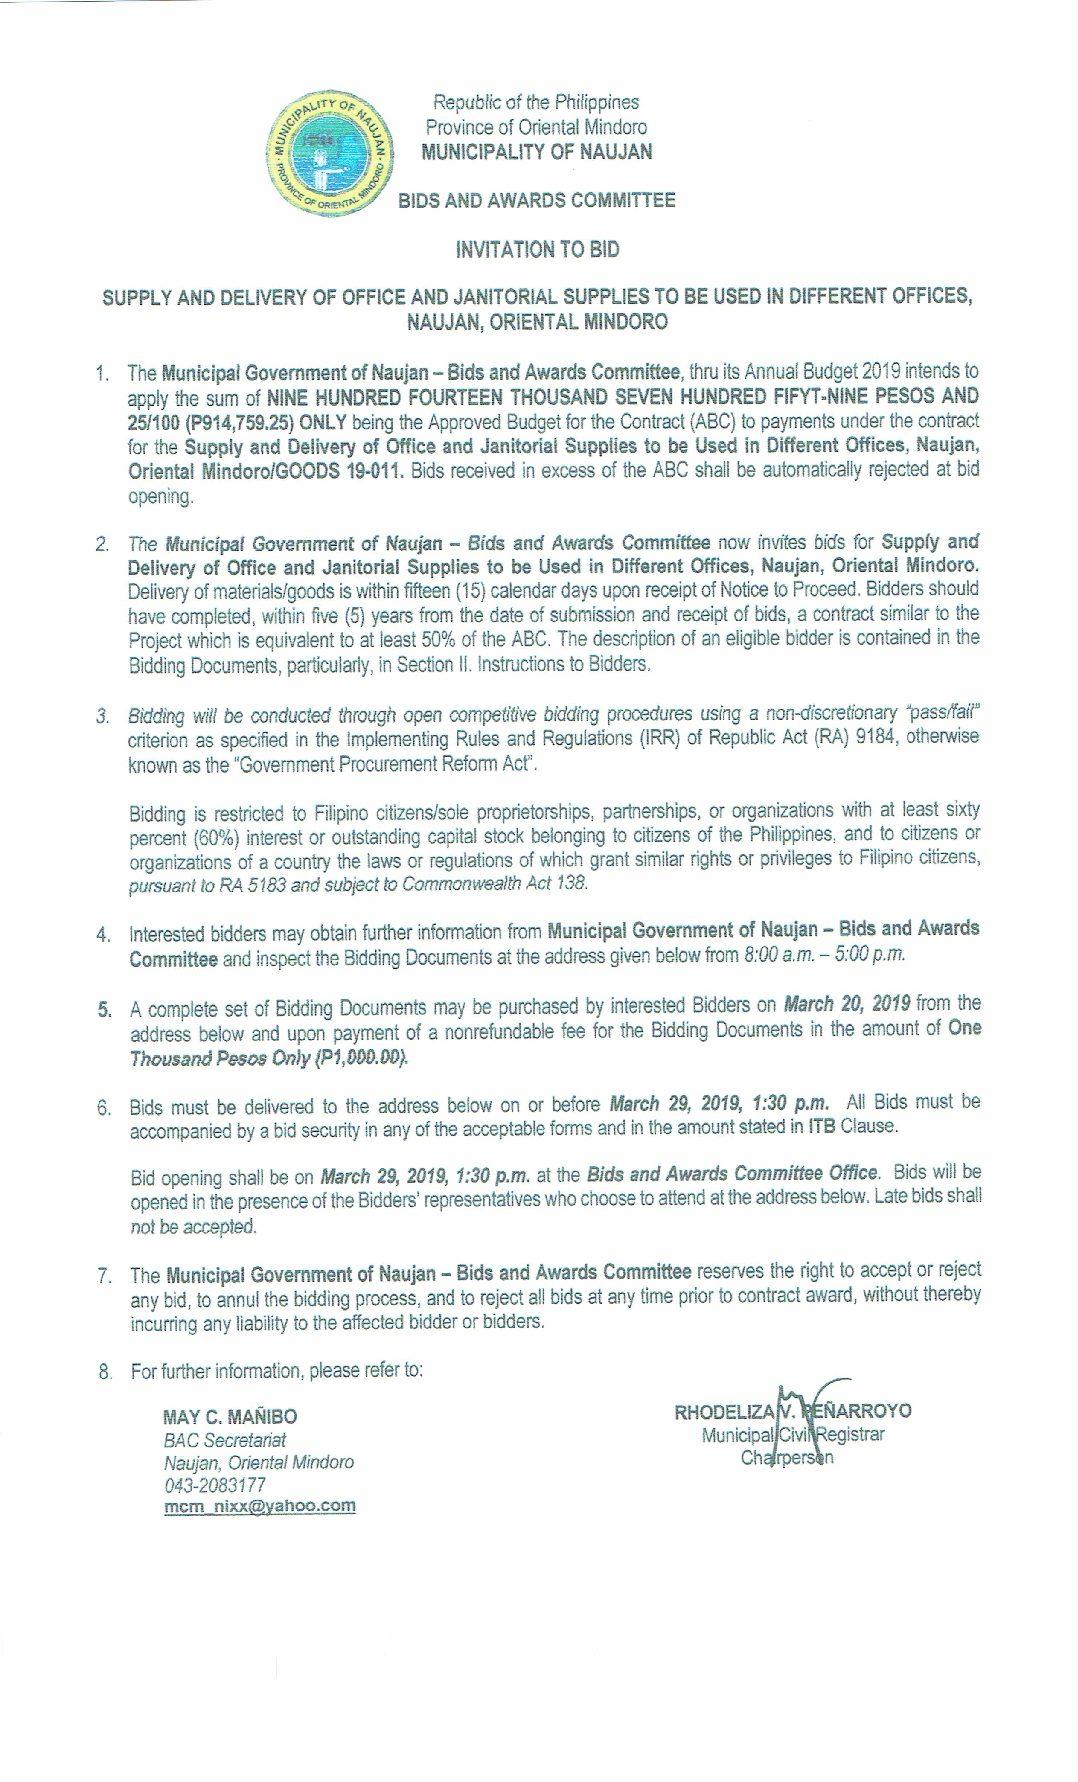 Bids and Awards Committee | Municipality of Naujan